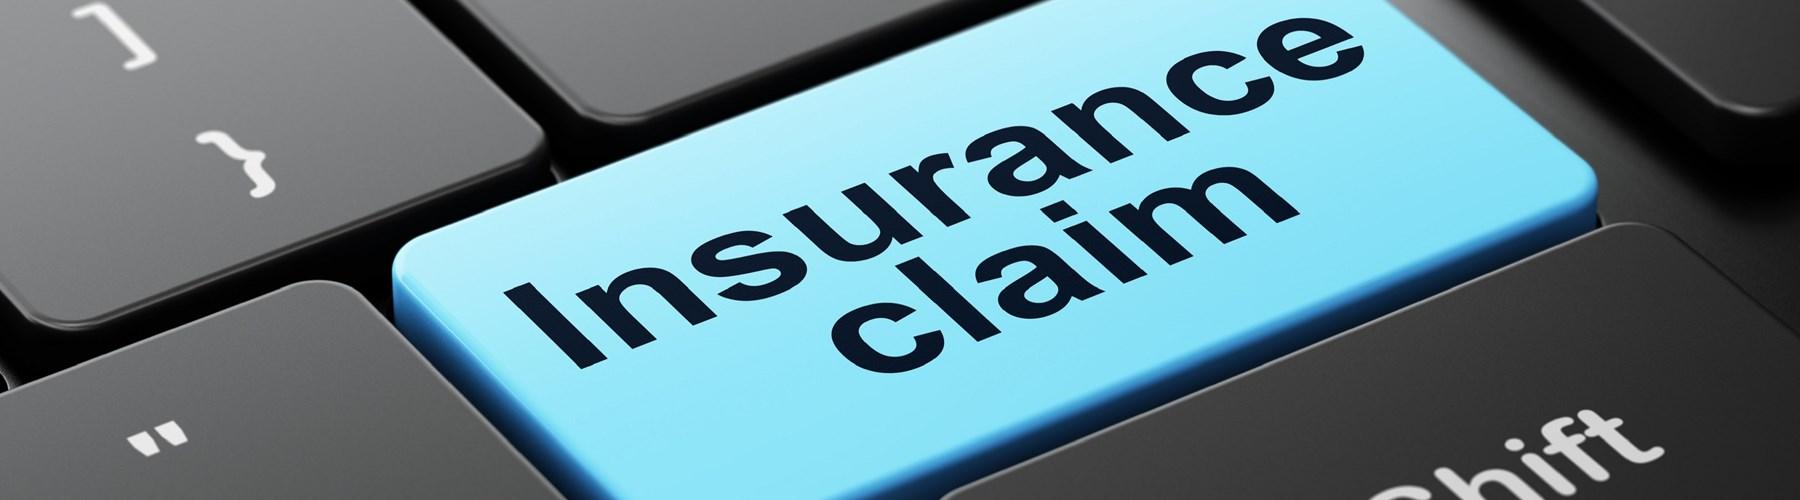 Insurance claim computer key